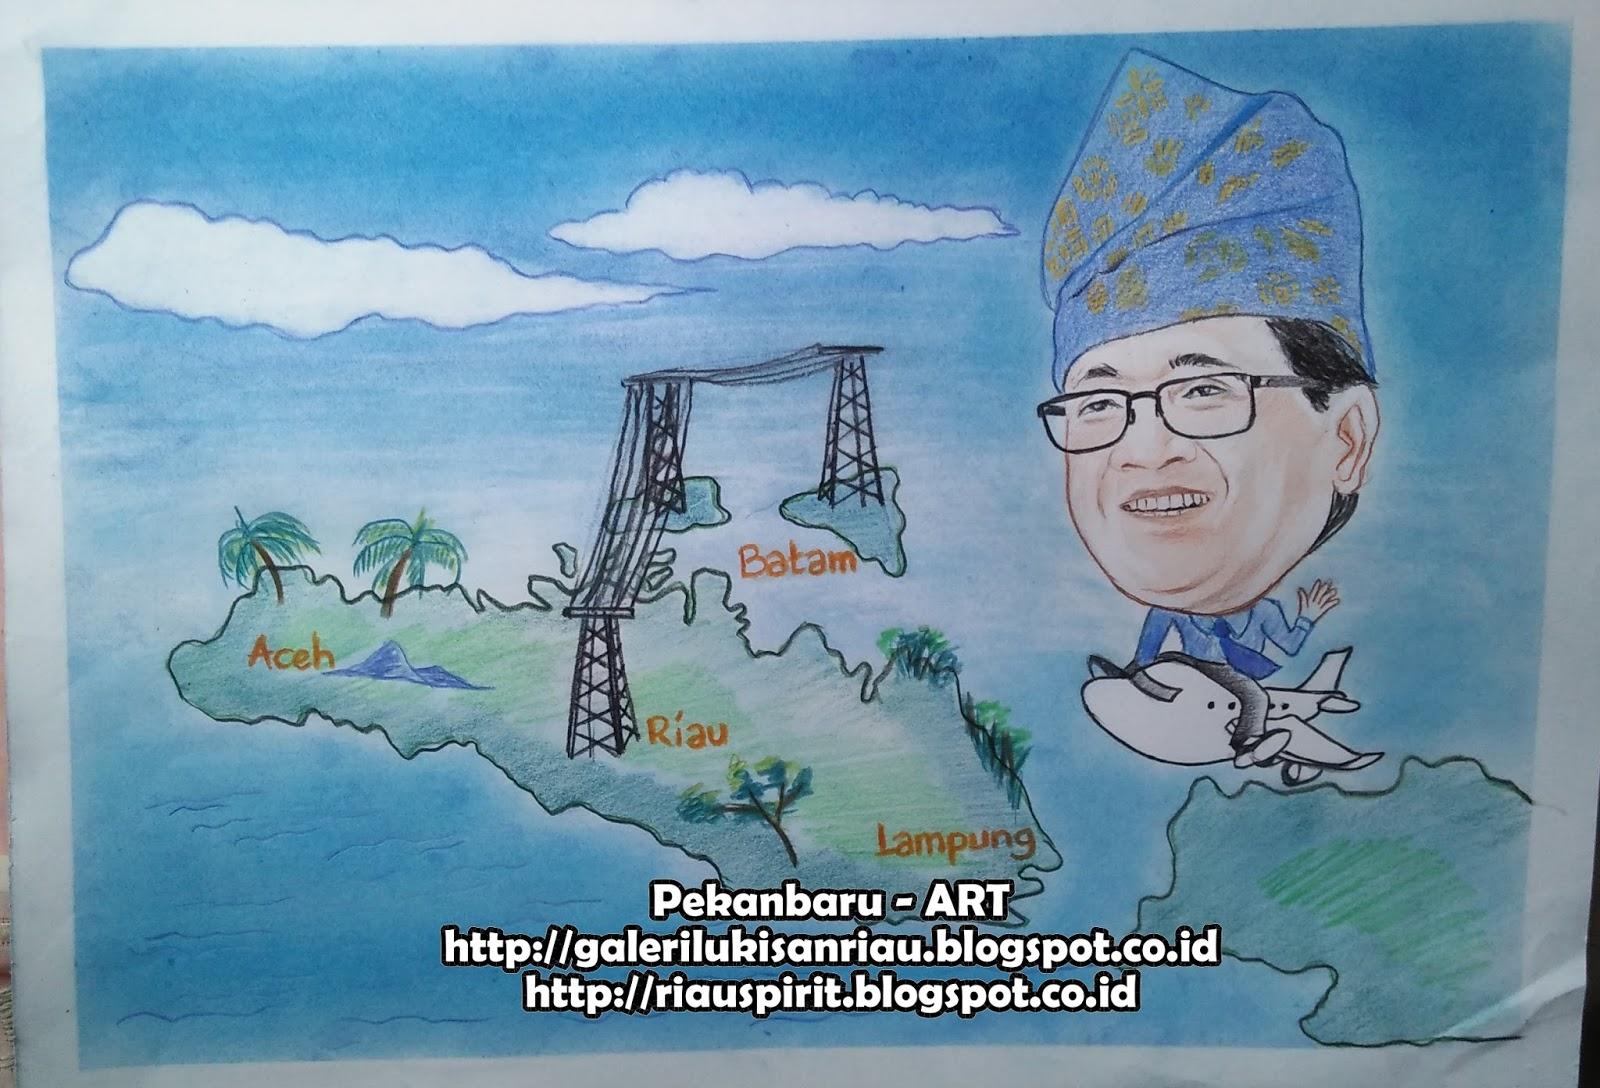 Pekanbaru ART Lukisan Sketsa Wajah Dan Karikatur